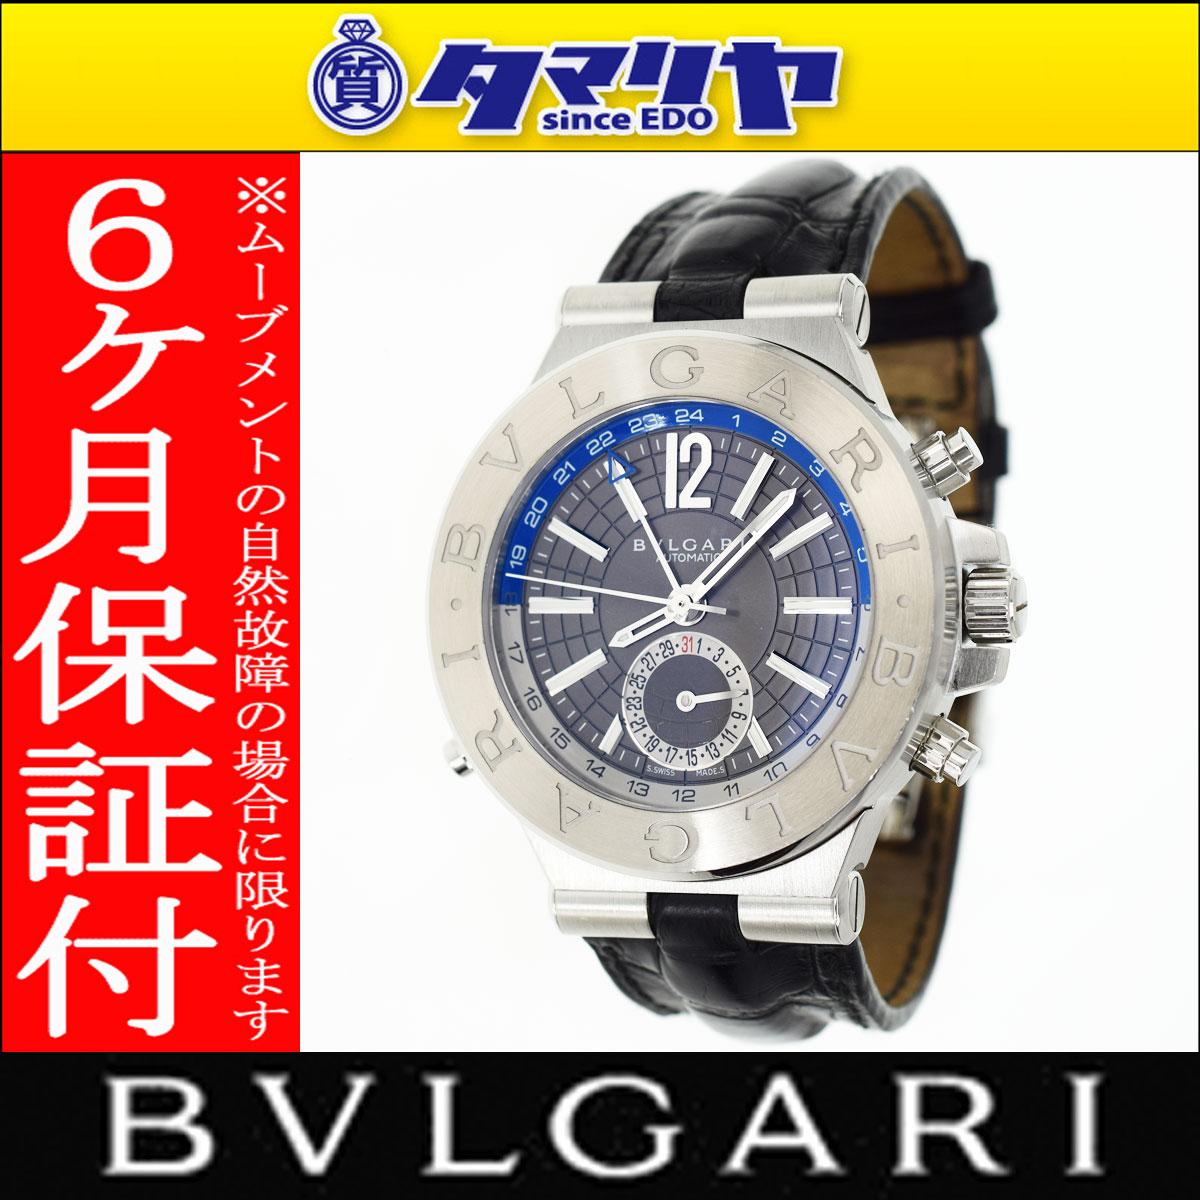 BVLGARI ブルガリ ディアゴノDG40S GMT 自動巻 SS ステンレス 【送料無料】【代引き手数料無料】腕時計 メンズ【中古】29200311